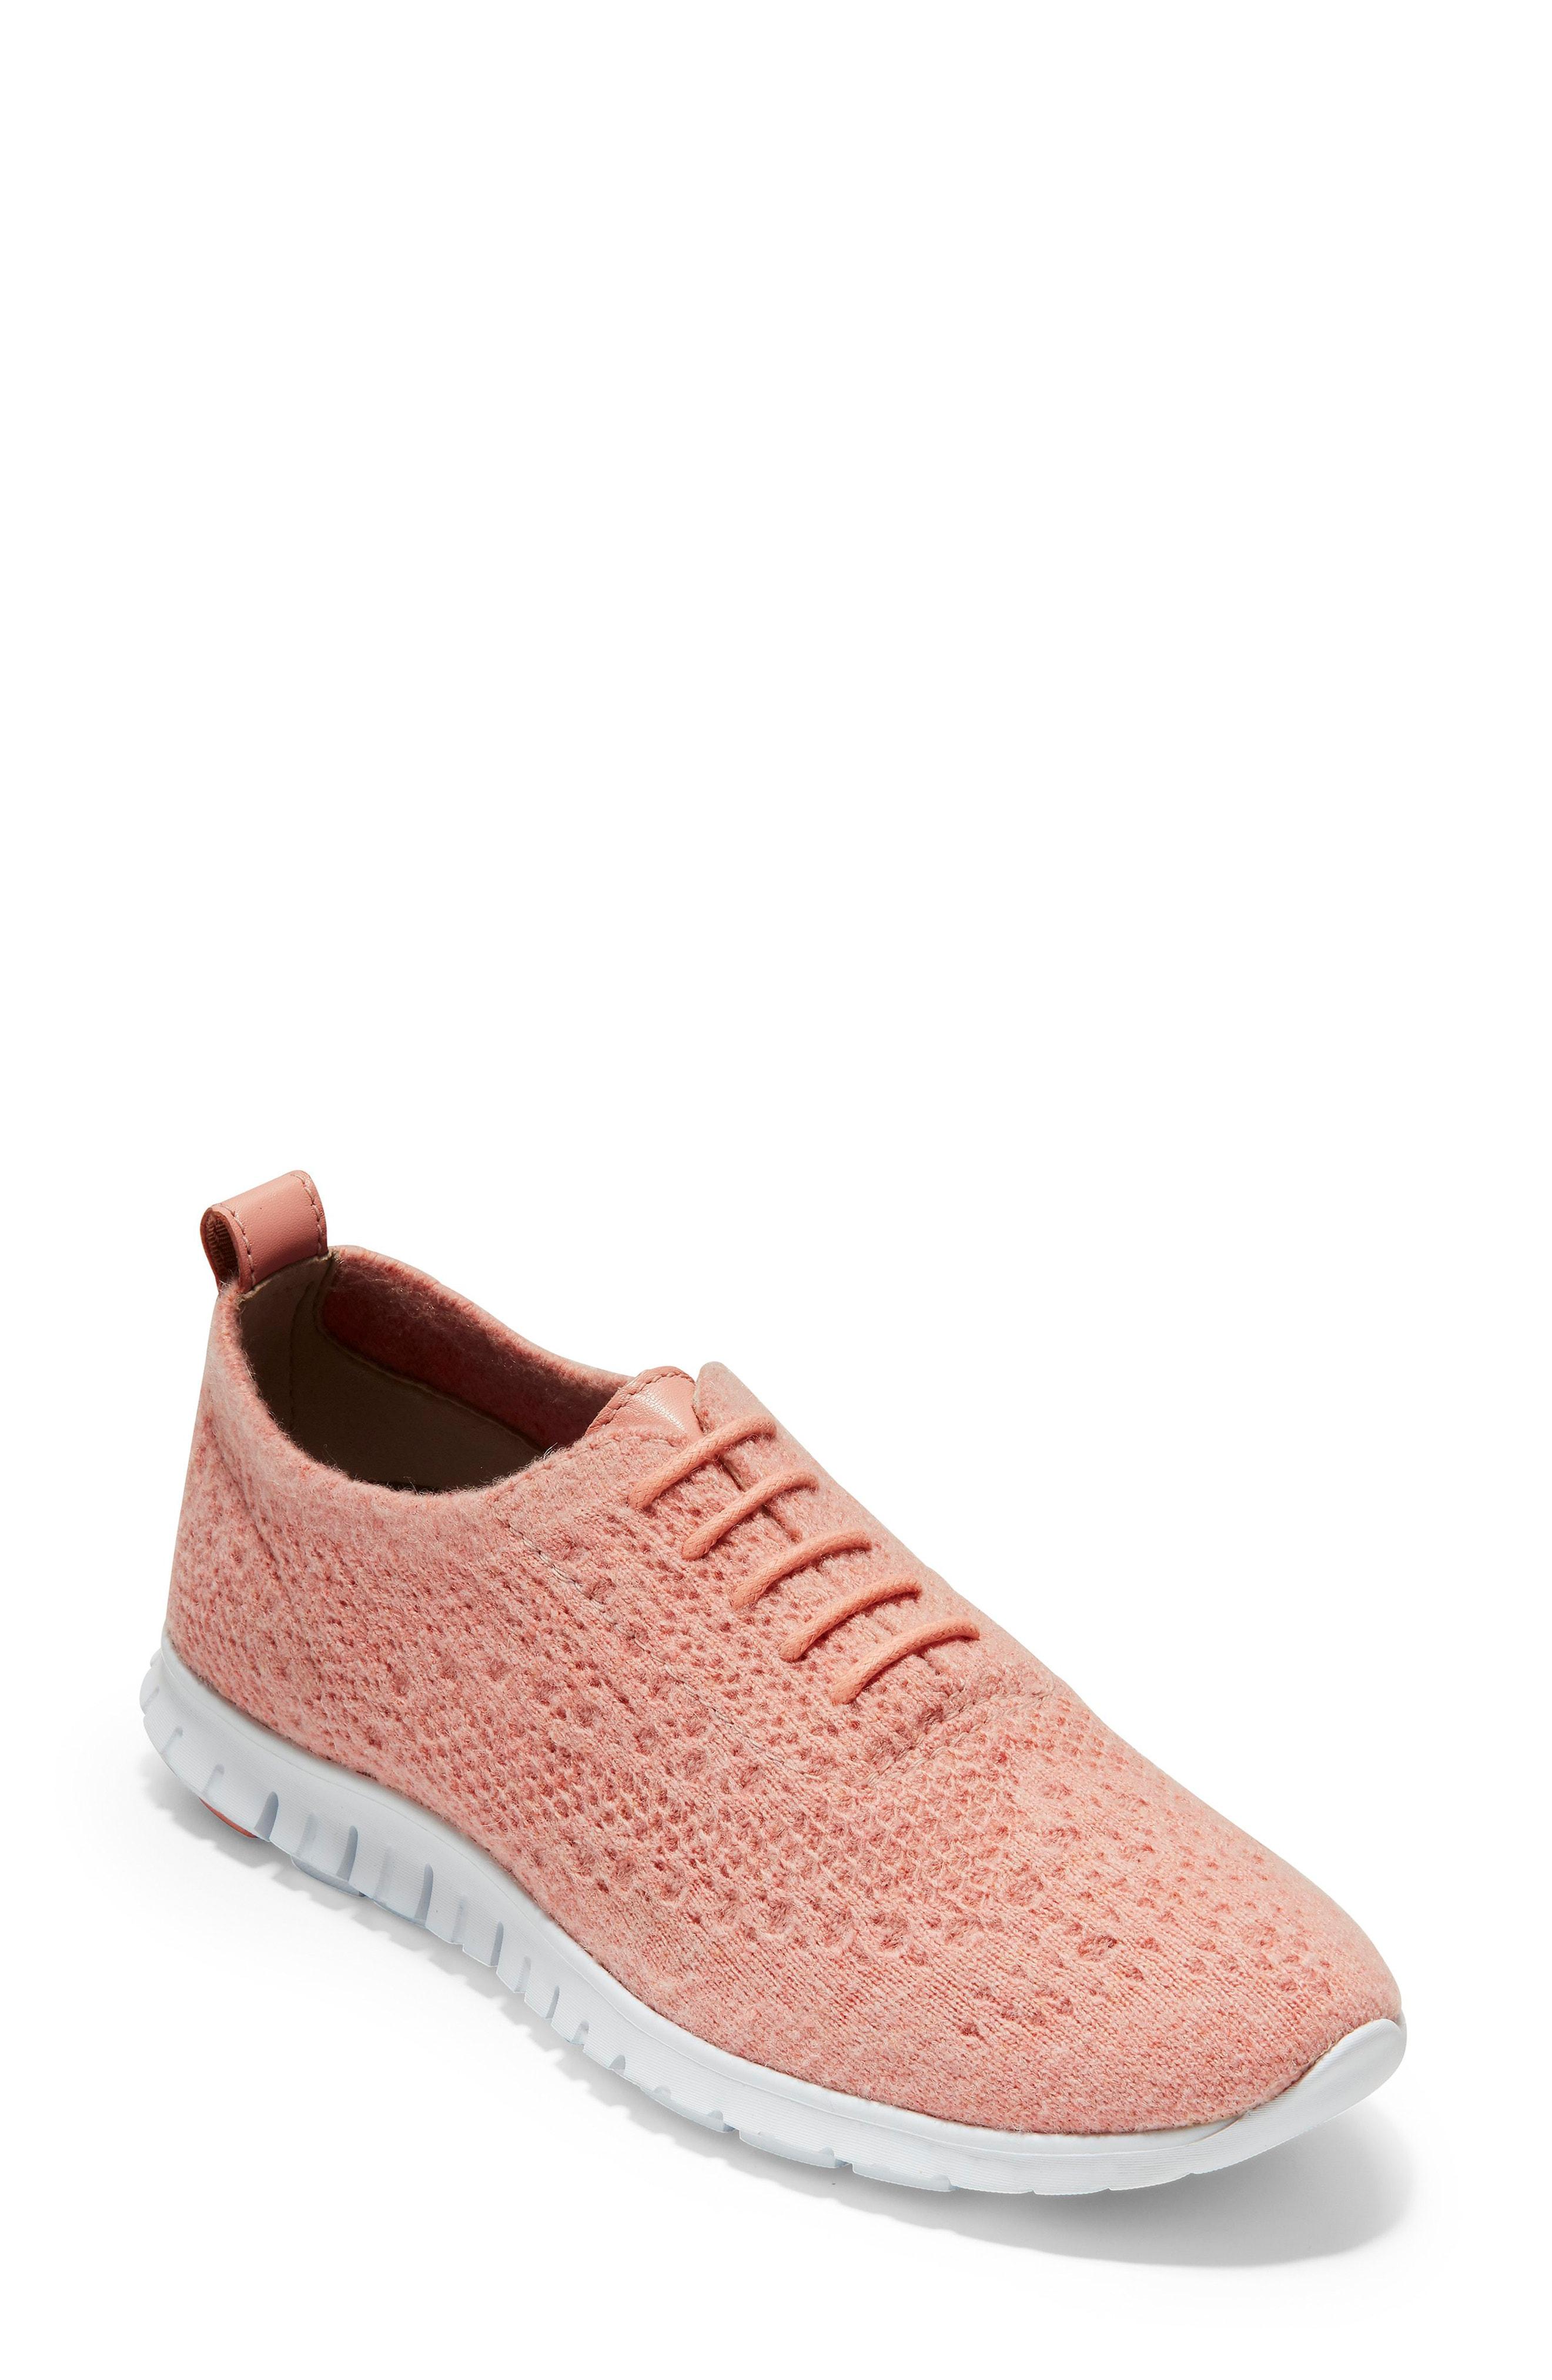 Cole Haan ZeroGrand Stitchlite Wool Flat (Women)